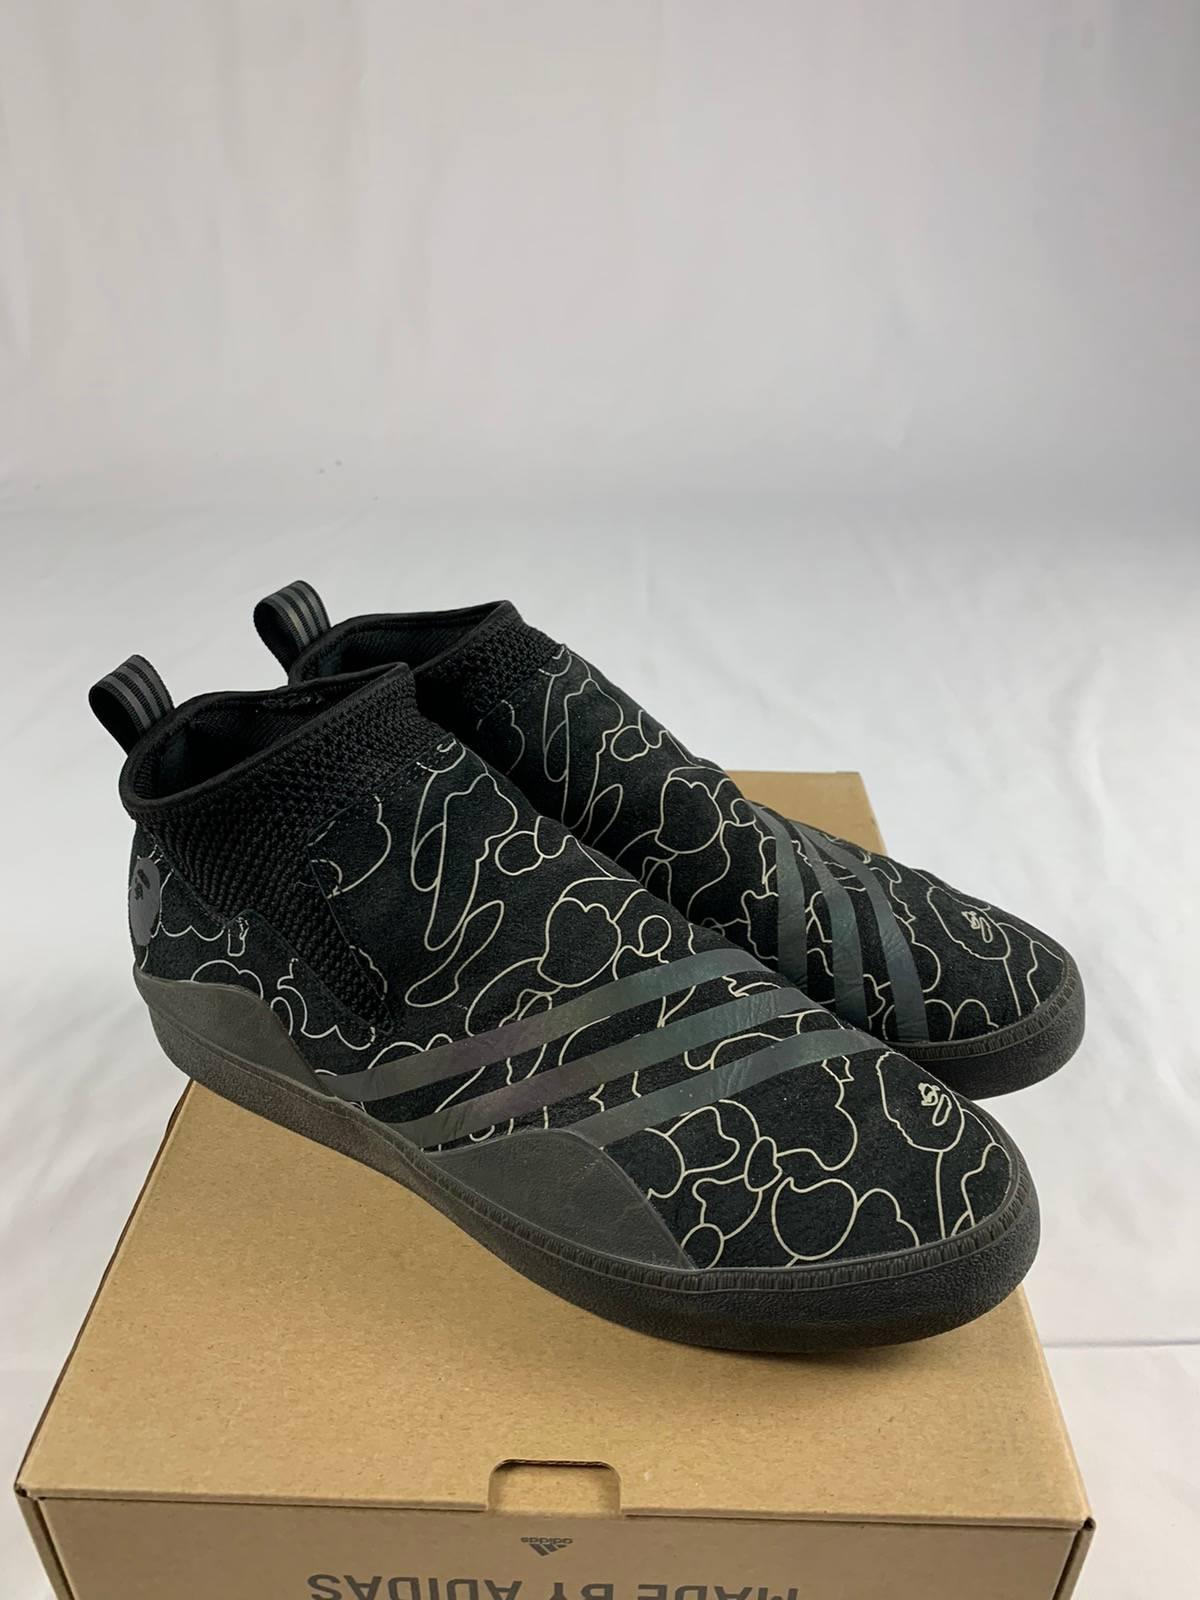 Cambiarse de ropa pasta ensalada  Adidas Bape X Adidas 3st.002 Skate Shoes   Grailed